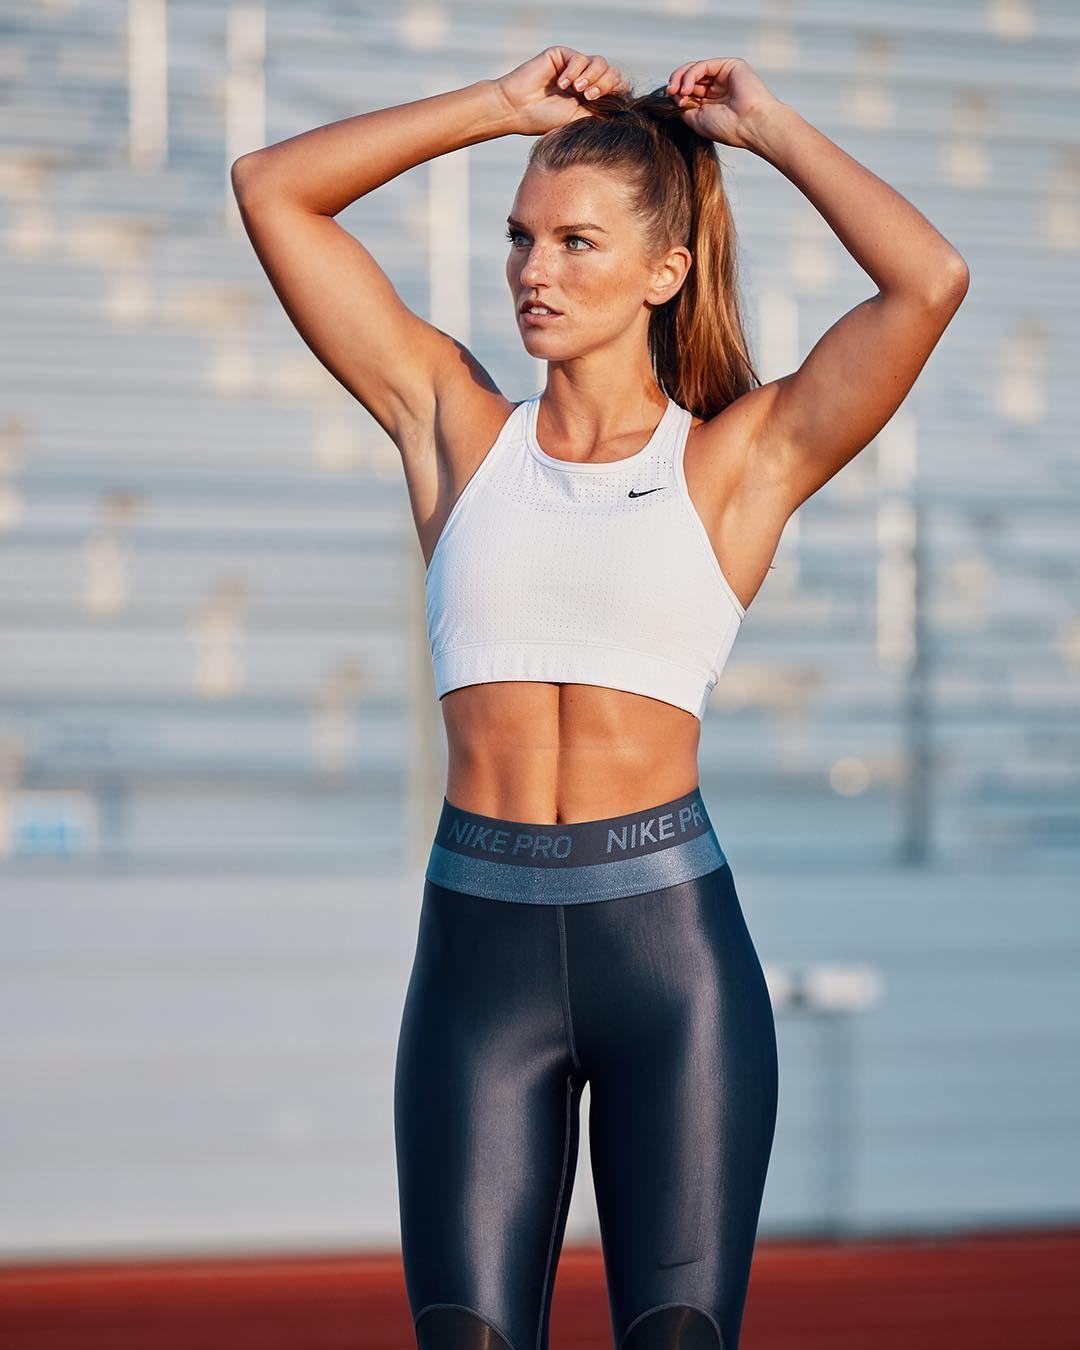 10 Atlet Perempuan yang Punya Tubuh Seksi, Nggak Hanya Jago Olahraga!